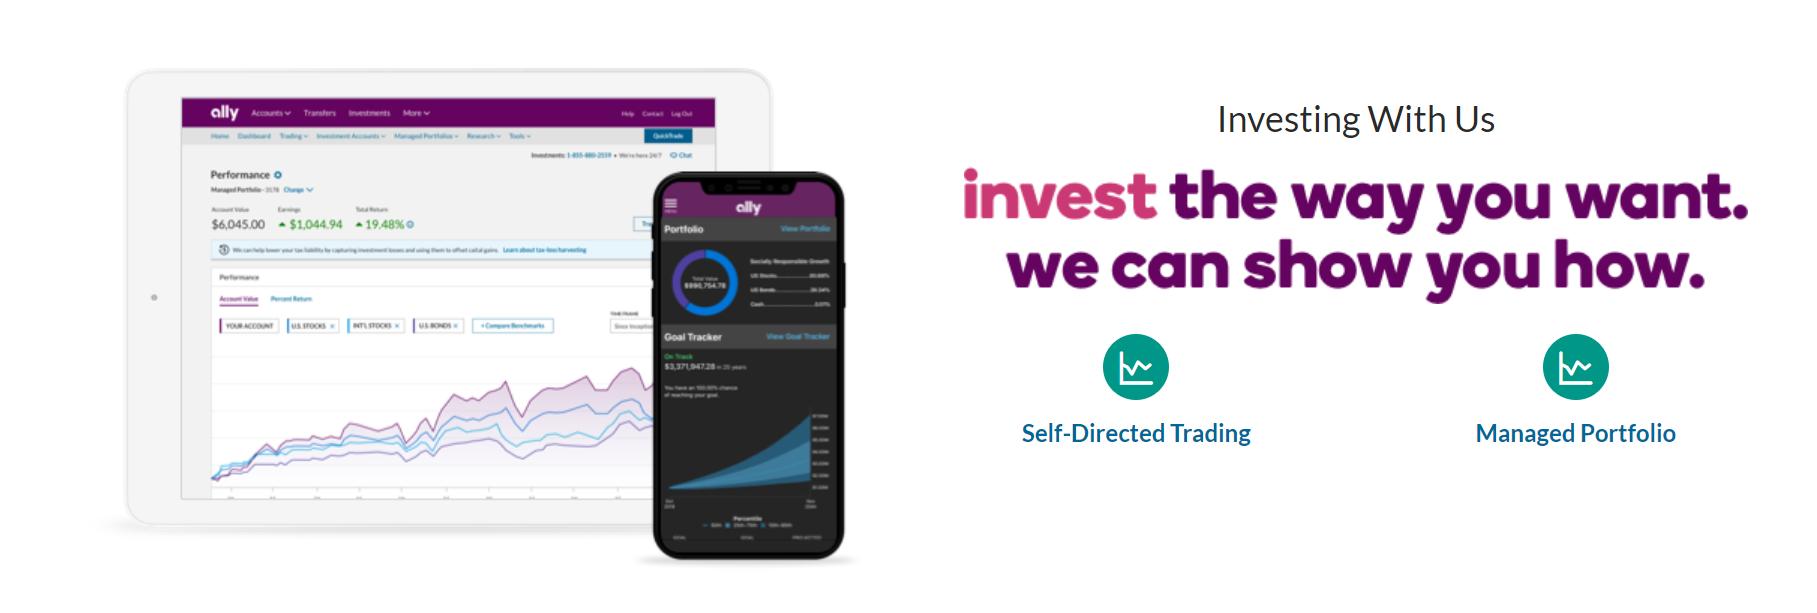 ally invest platform